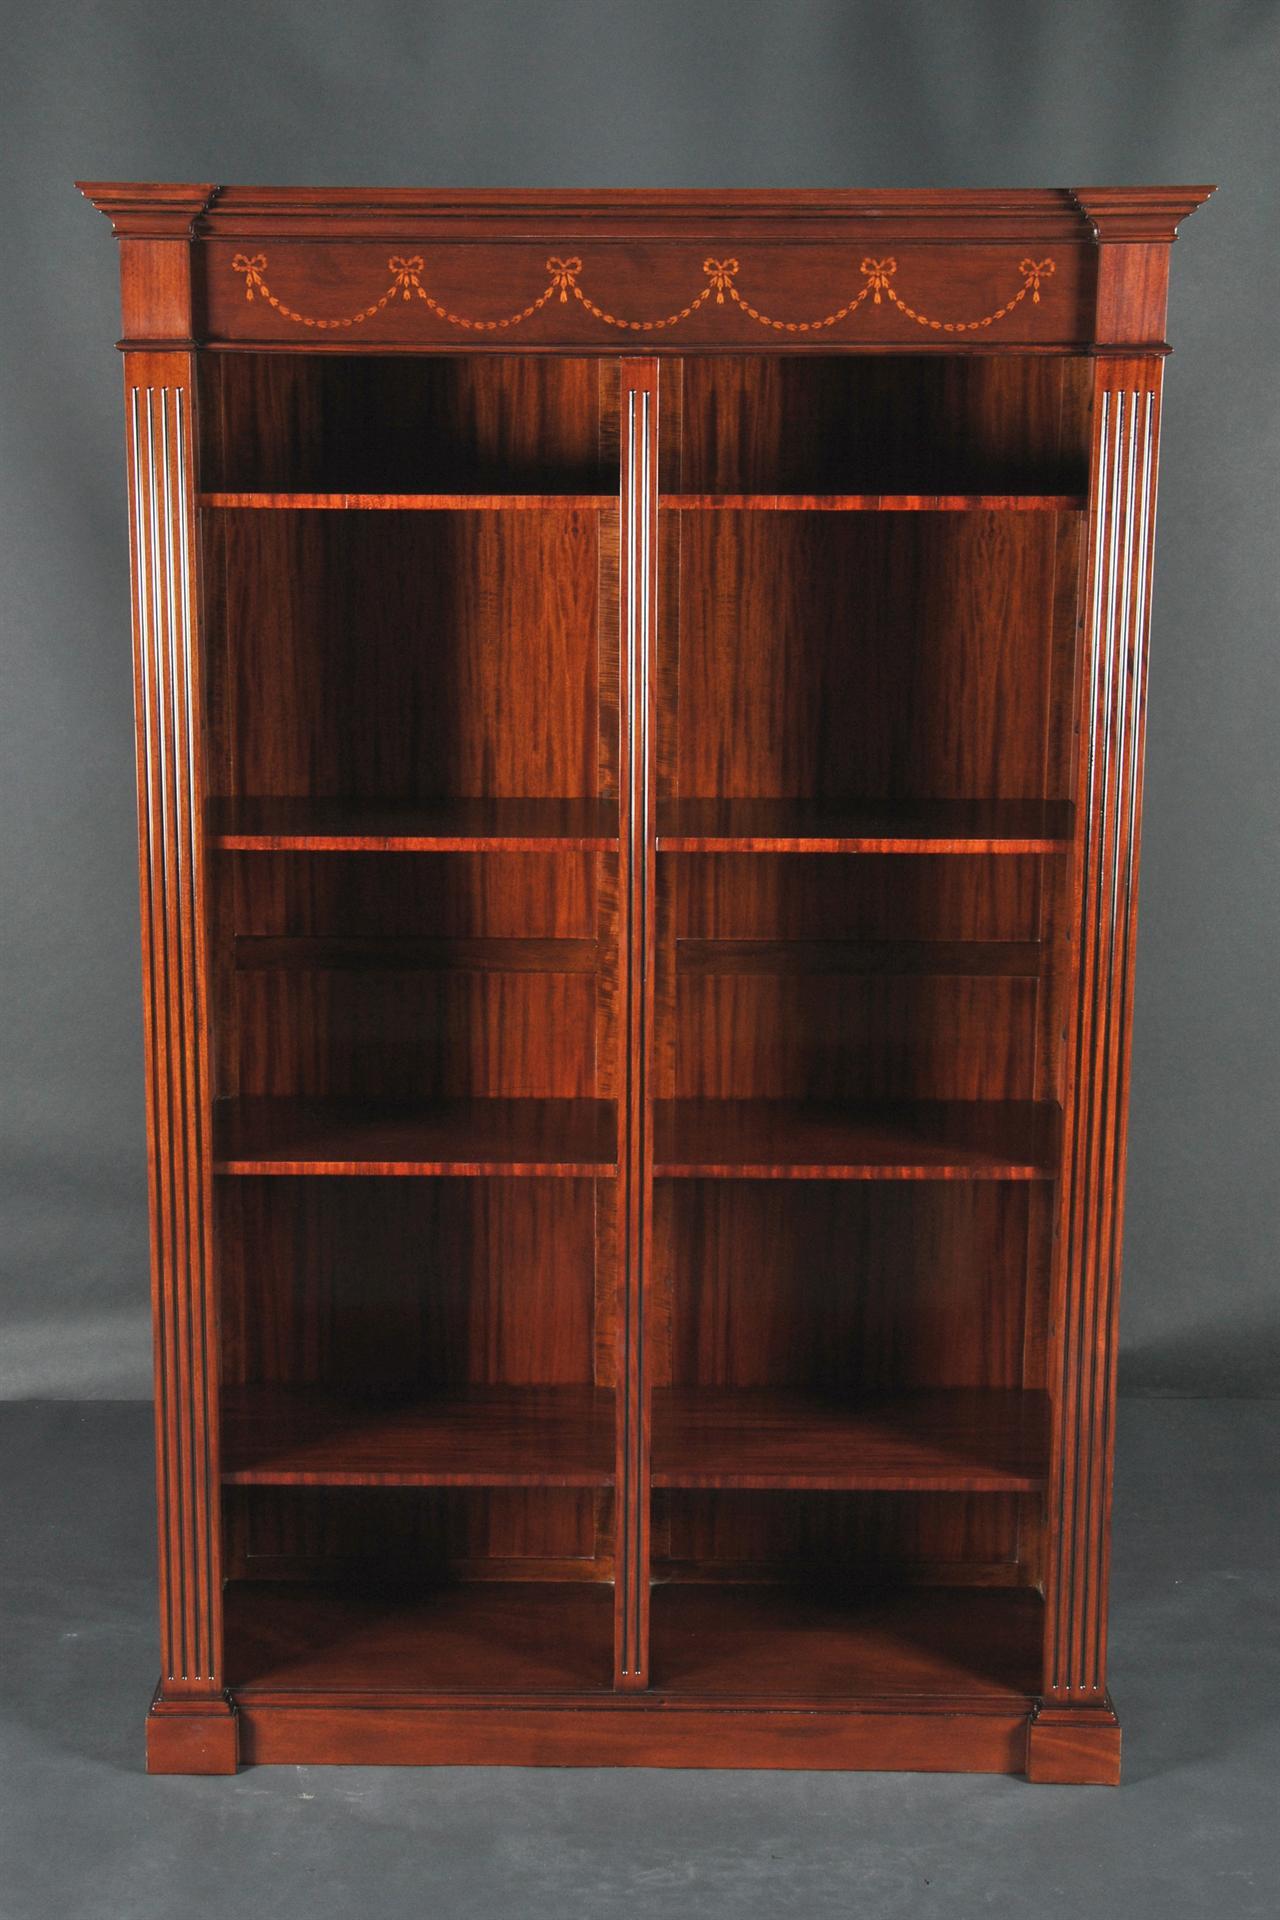 Sheraton Style Antique Reproduction Inlaid Mahogany Bookcase